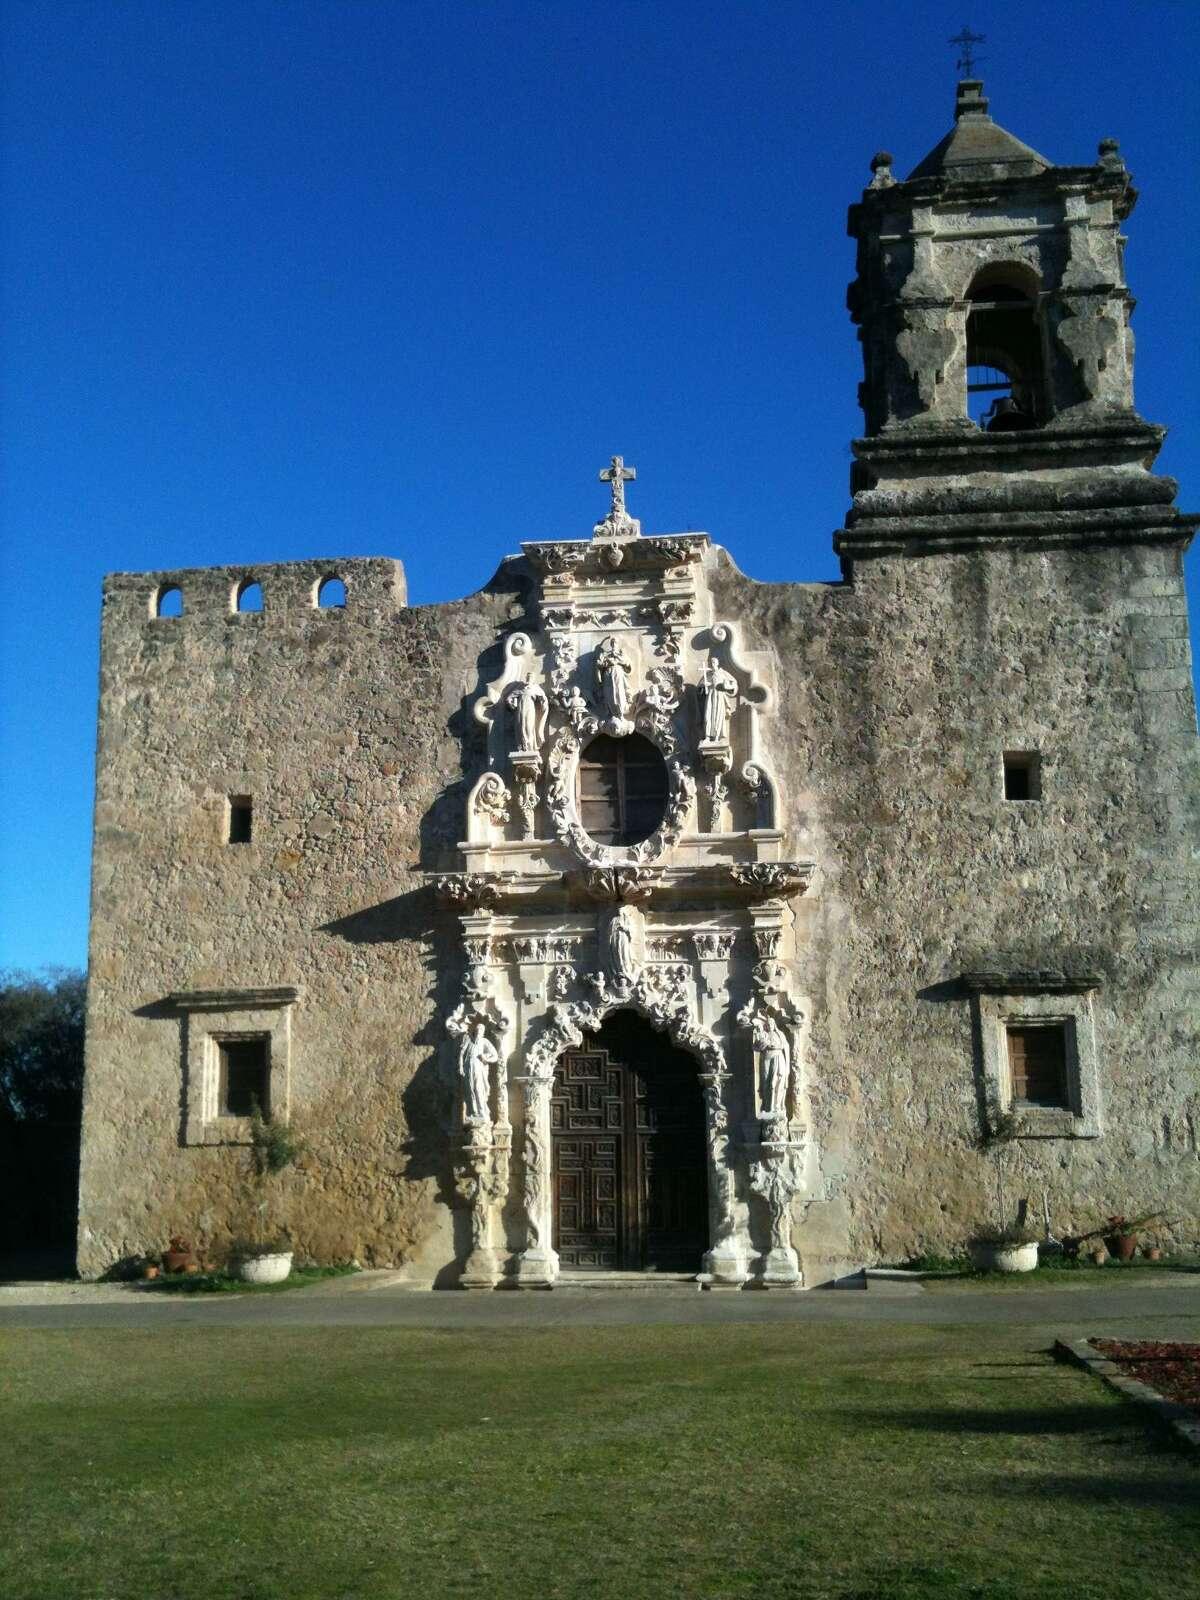 The San Jose Mission in San Jose, Texas.